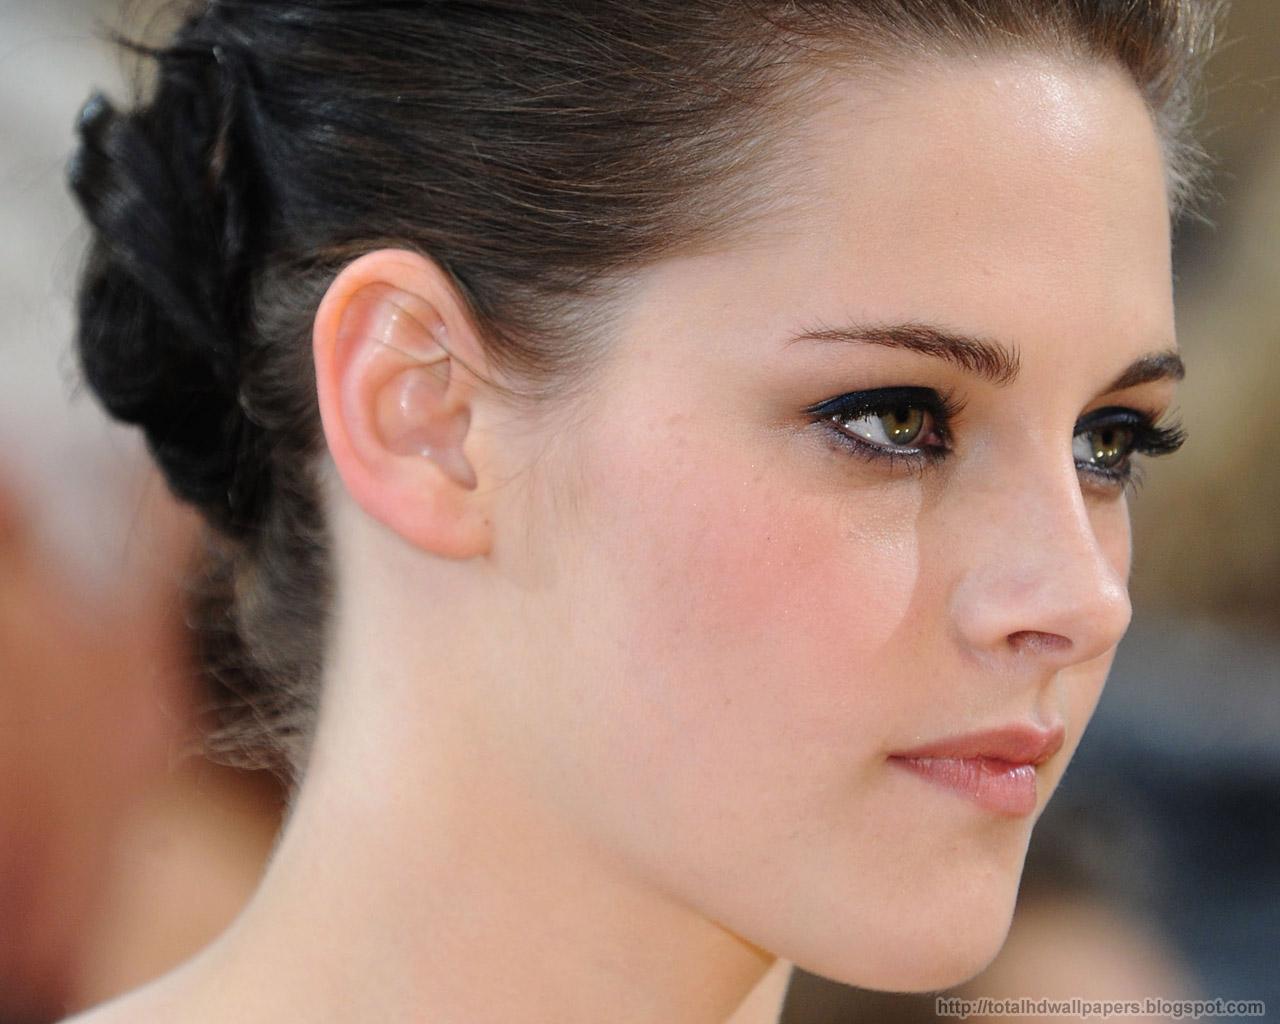 kristen stewart hollywood actress - photo #24